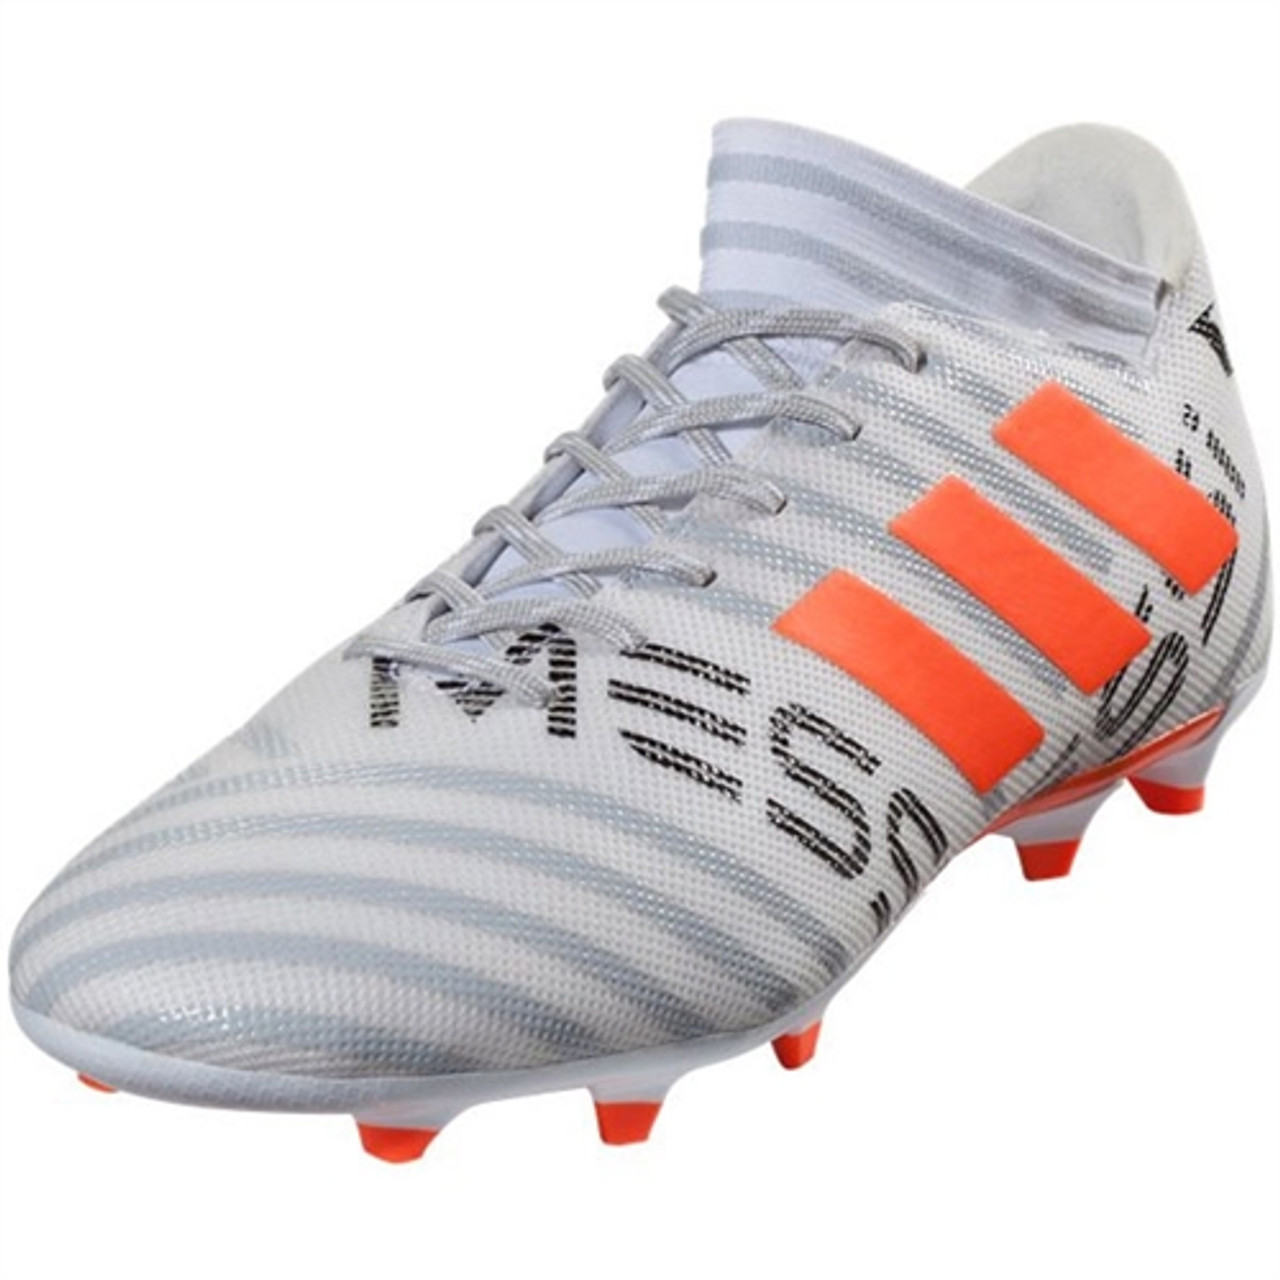 8dac4e1f96509 Adidas Nemeziz Messi 17.3 FG - White/Solar Orange (101917) - ohp soccer